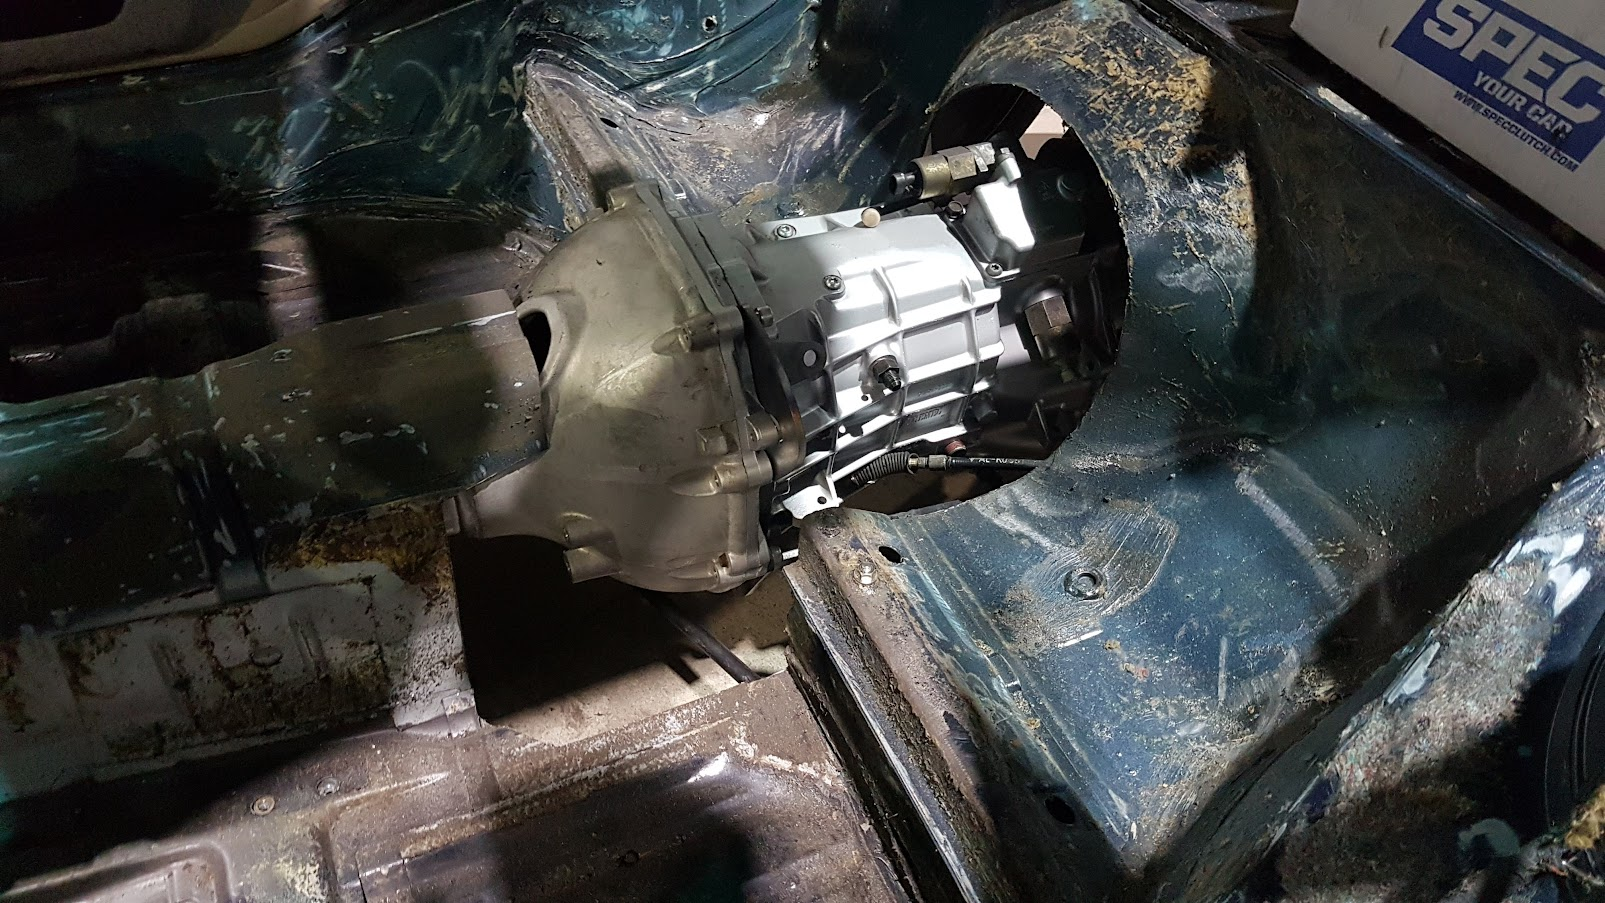 Sharkey's 944 corvette t56 swap thread ACtC-3d9mz9L8MSlW3RG67CaLYacOsKUwlISYpXs5Ry2JOts30DRtP7IliZzqTWbPMOFZYM7RAqnA53I0mIKipL5sGdMj1mnbe75AyGXGDUcG3WZzPhhdxKcwjT51o_lZGWlHPM8_omFG_Rr3VDKMhupZev9=w1605-h903-no?authuser=0